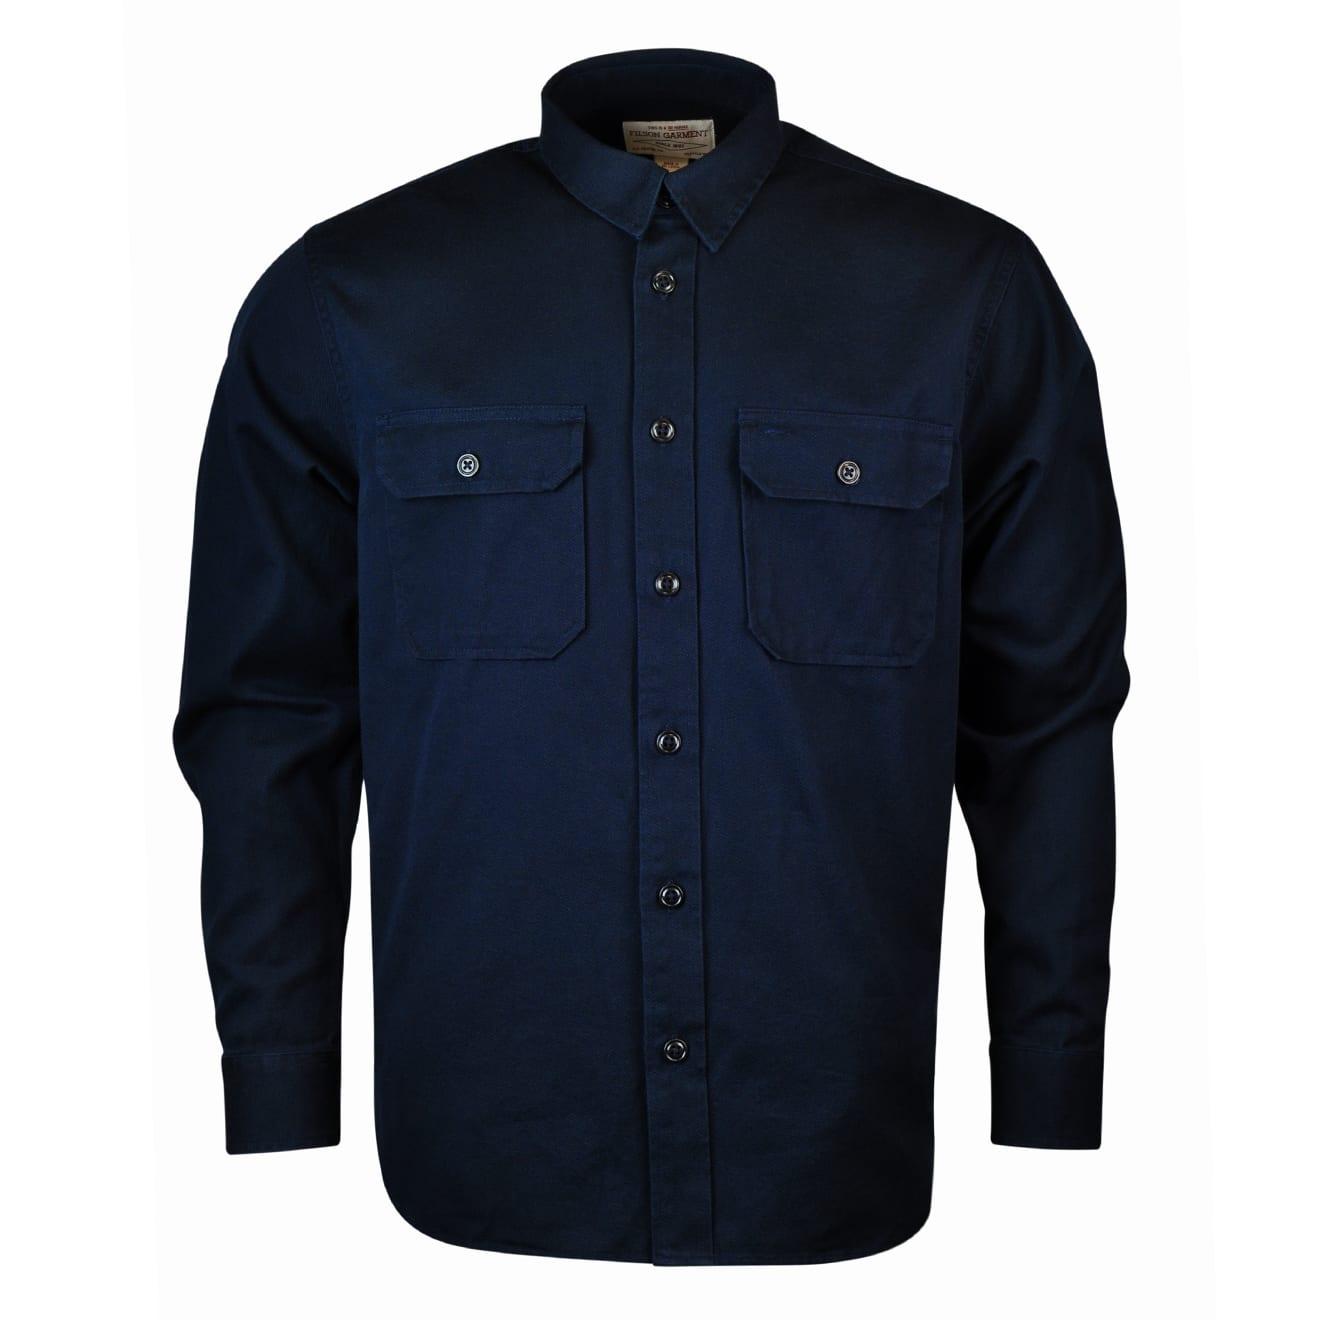 Filson 6oz Drill Chino Shirt Storm Navy